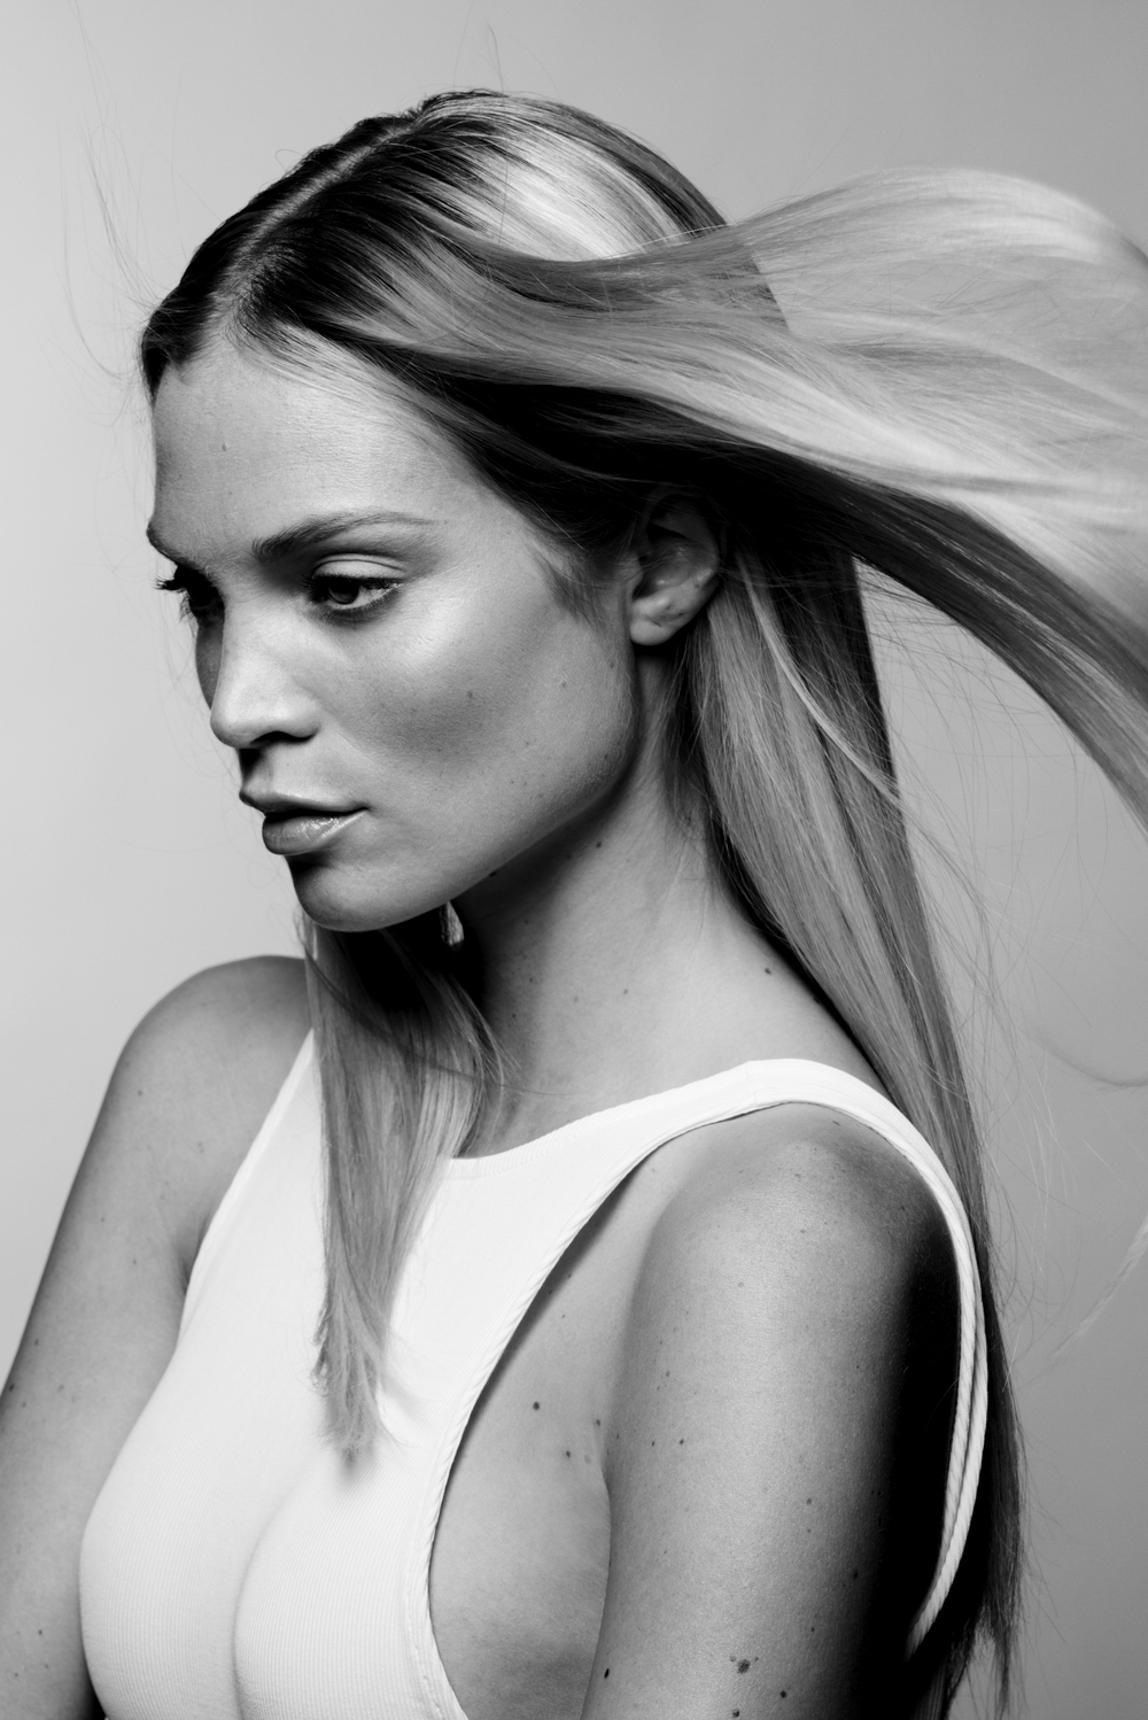 laura_beauty-22_1.jpg